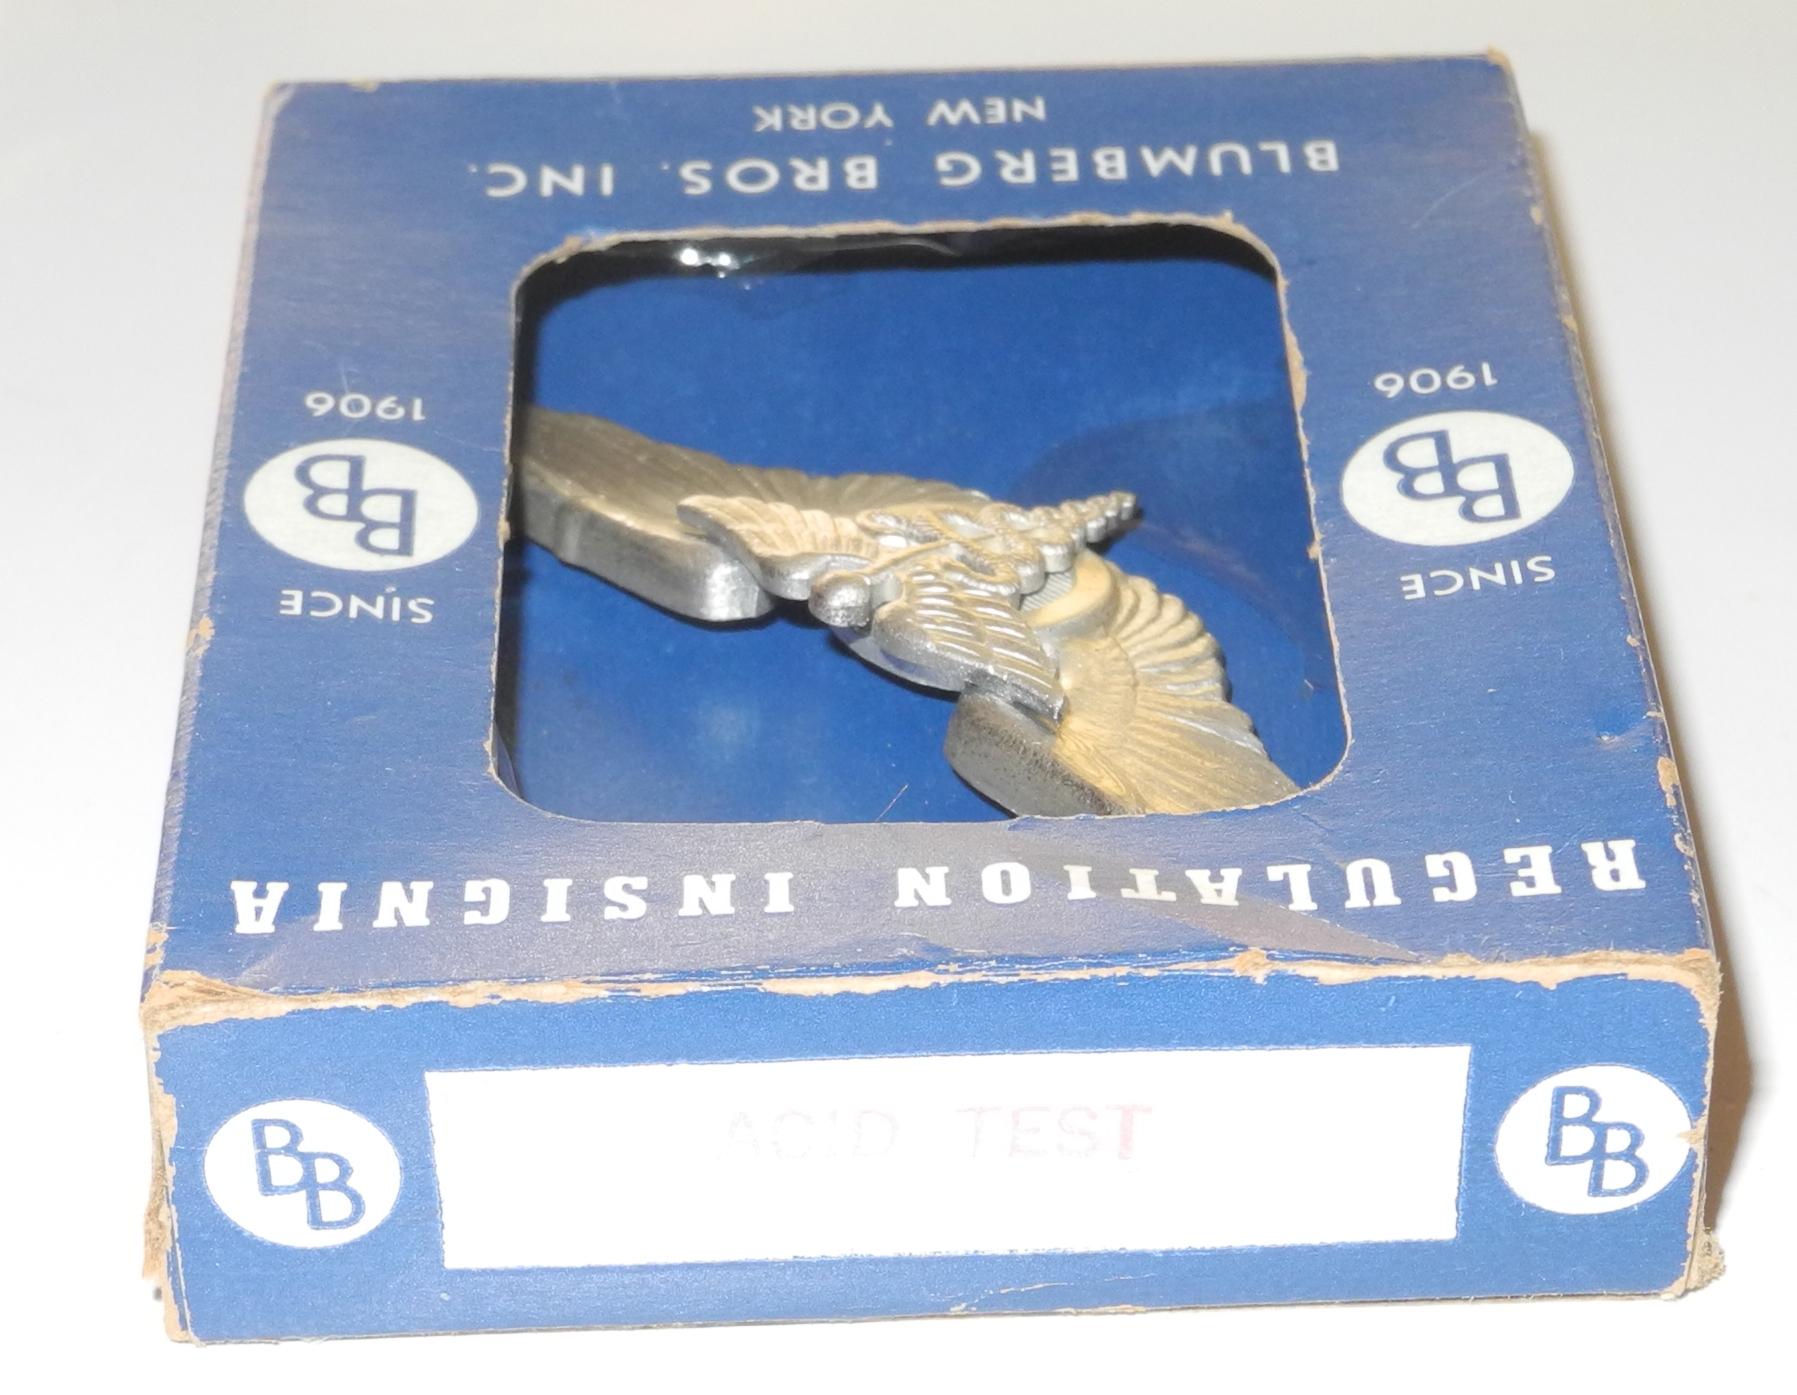 WWII period full-size silver flight surgeon's wing in original box, unused.